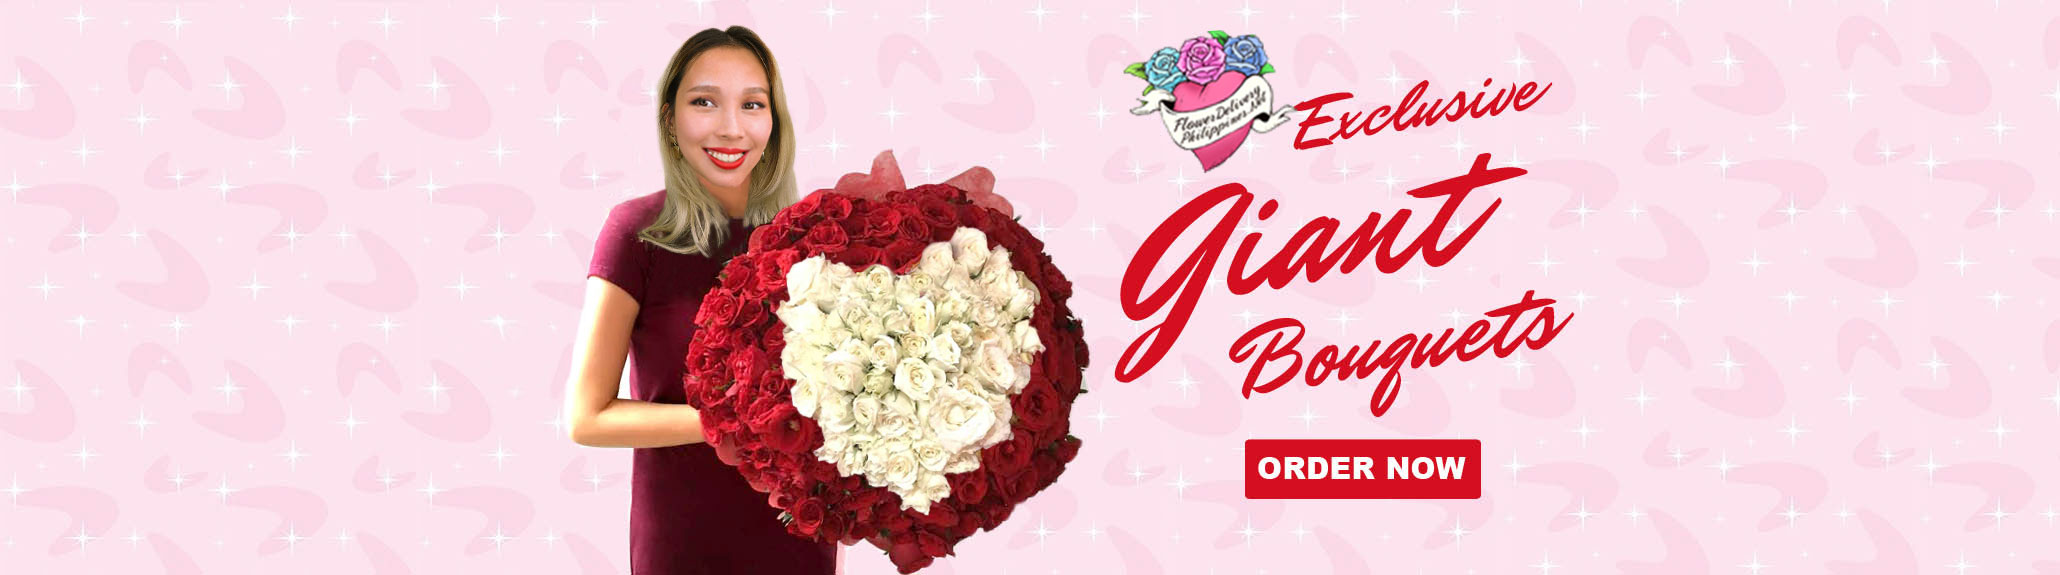 giant-bouquet-manila.jpg